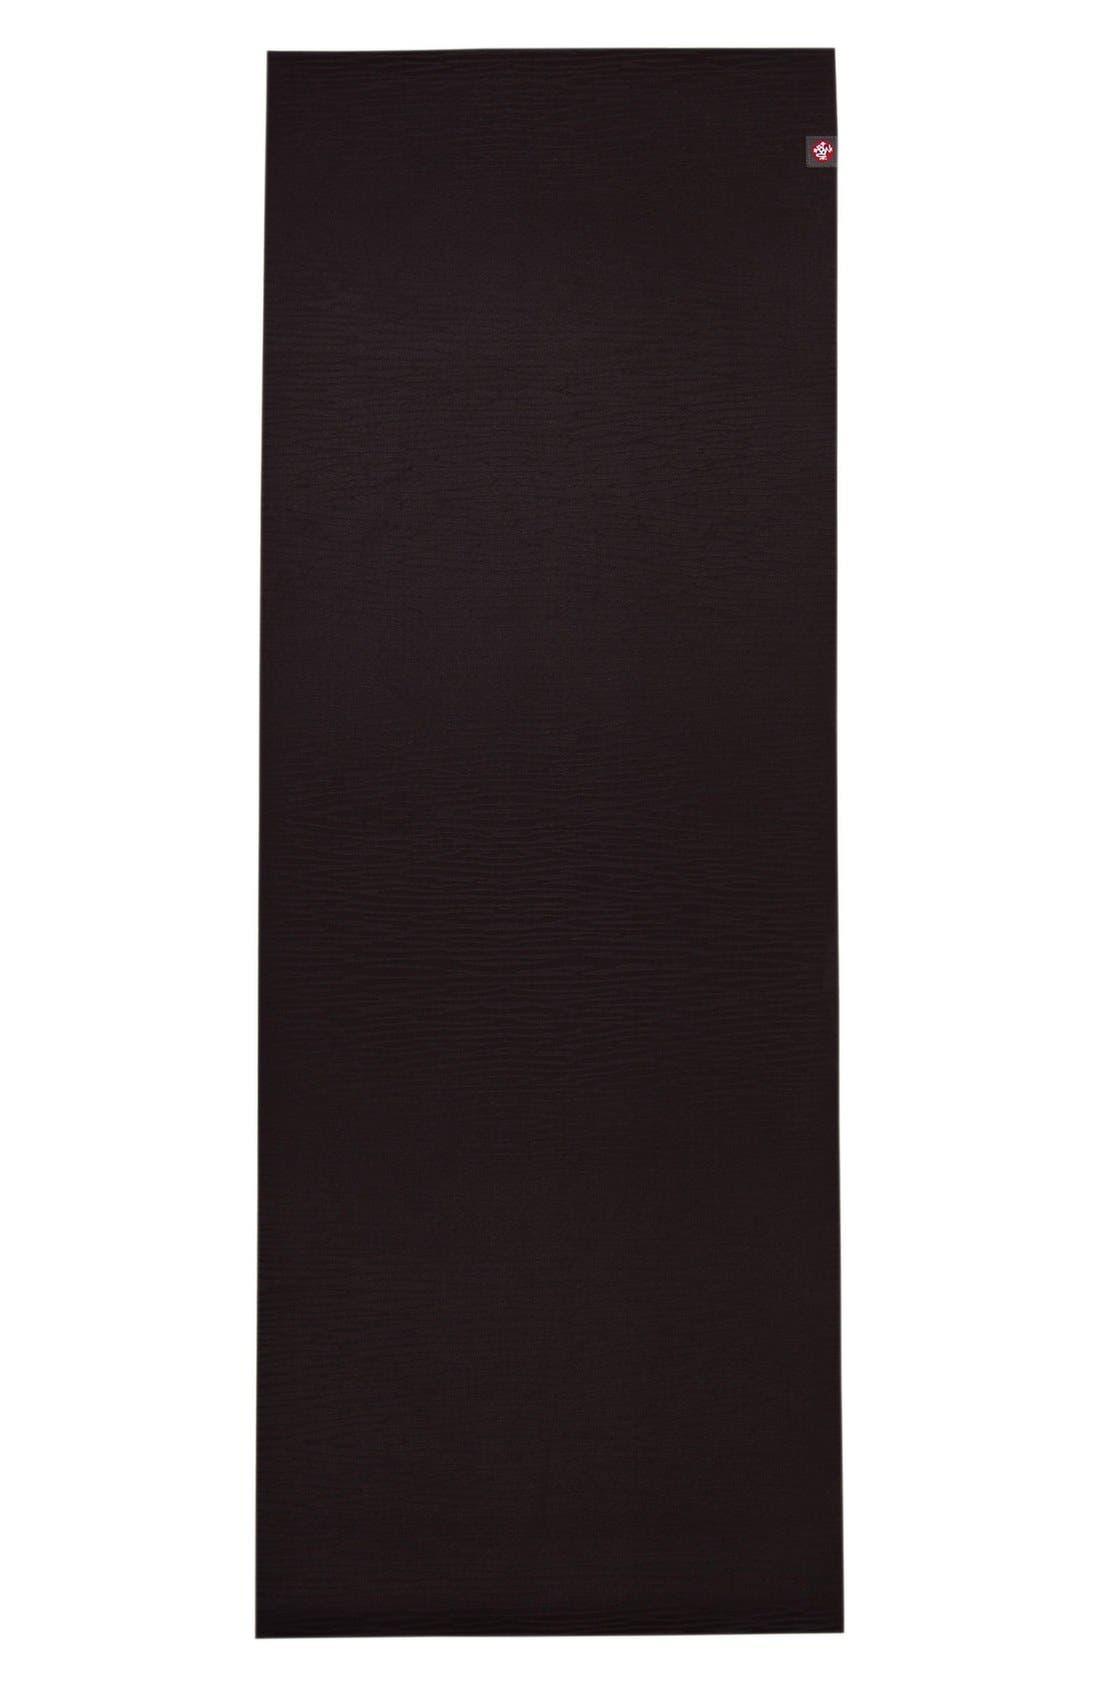 MANDUKA 'eKO Odina' Yoga Mat